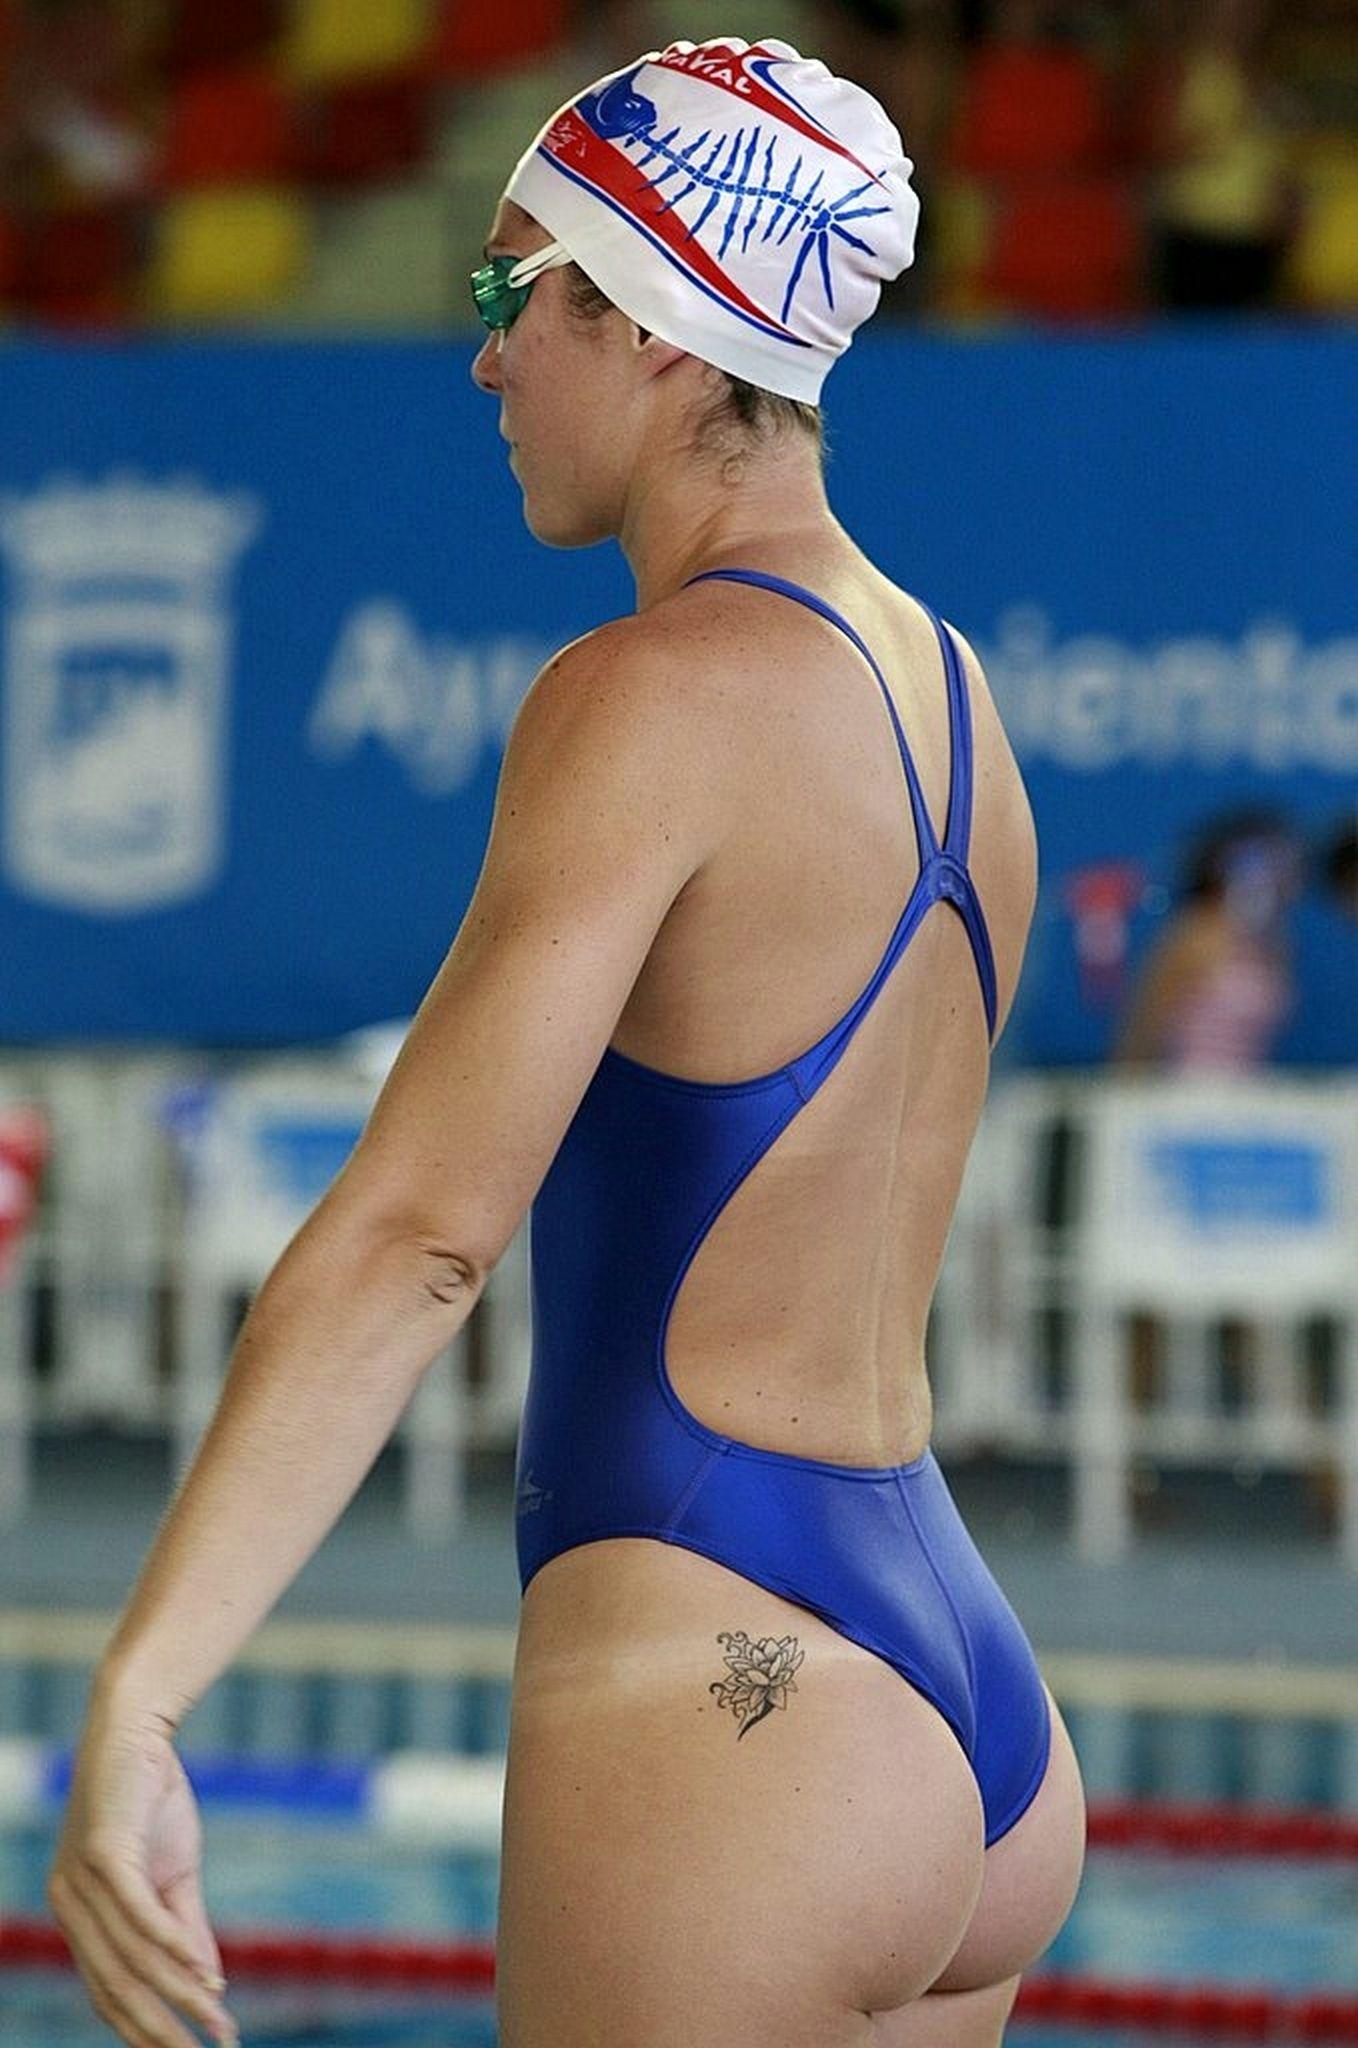 Winning high school swimmer disqualified over butt cheek wardrobe violation